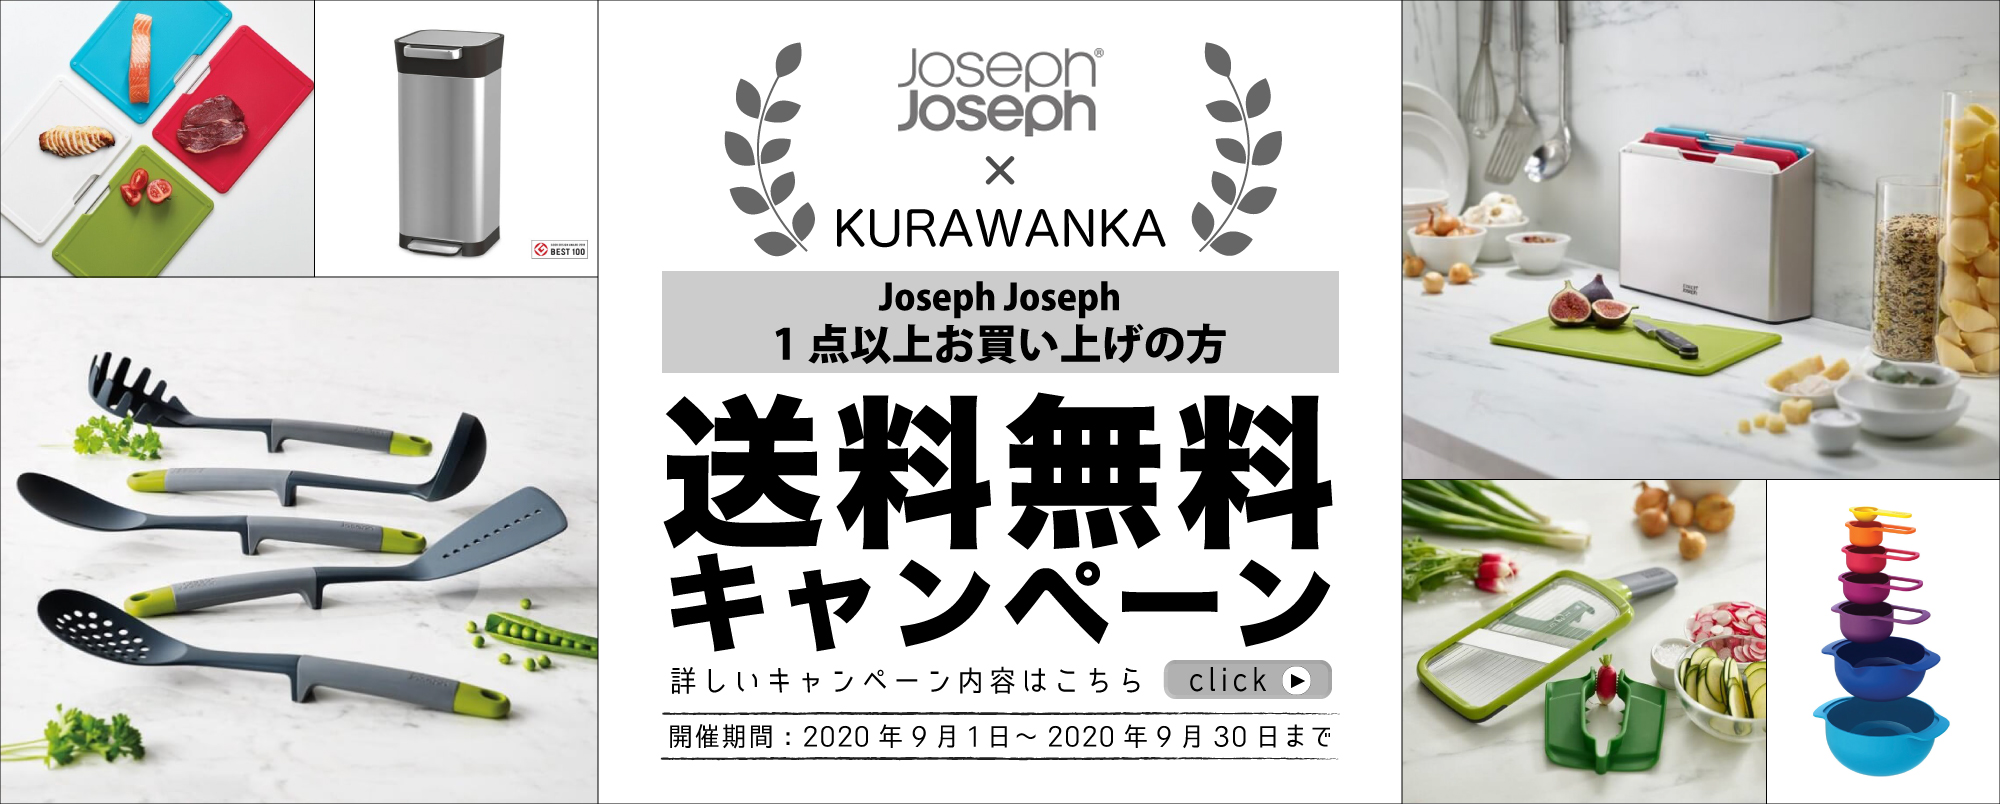 joseph_20200828_sample2 (1).jpg